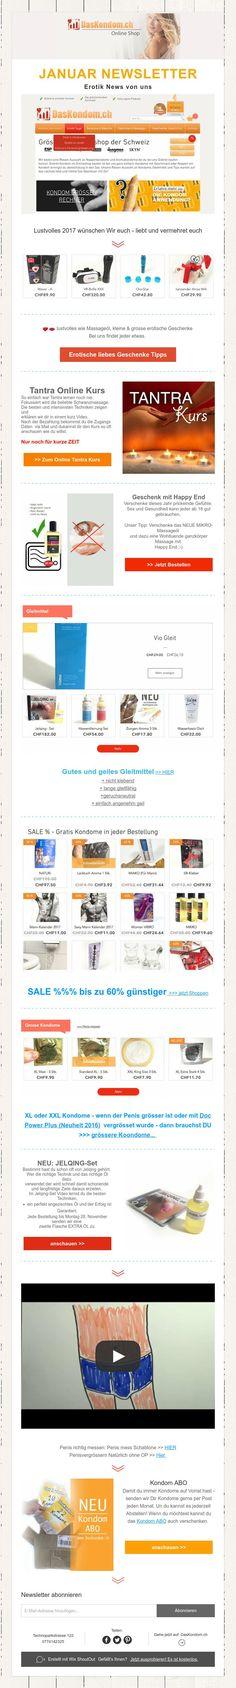 JANUAR NEWSLETTER  Erotik News von uns -  ♥ ♥ ♥ - #condom #kondom #kondomshop #kondome #condoms #noppenkondome #2017 #happynewyear #happy2017 Tantra, Switzerland, Erotica